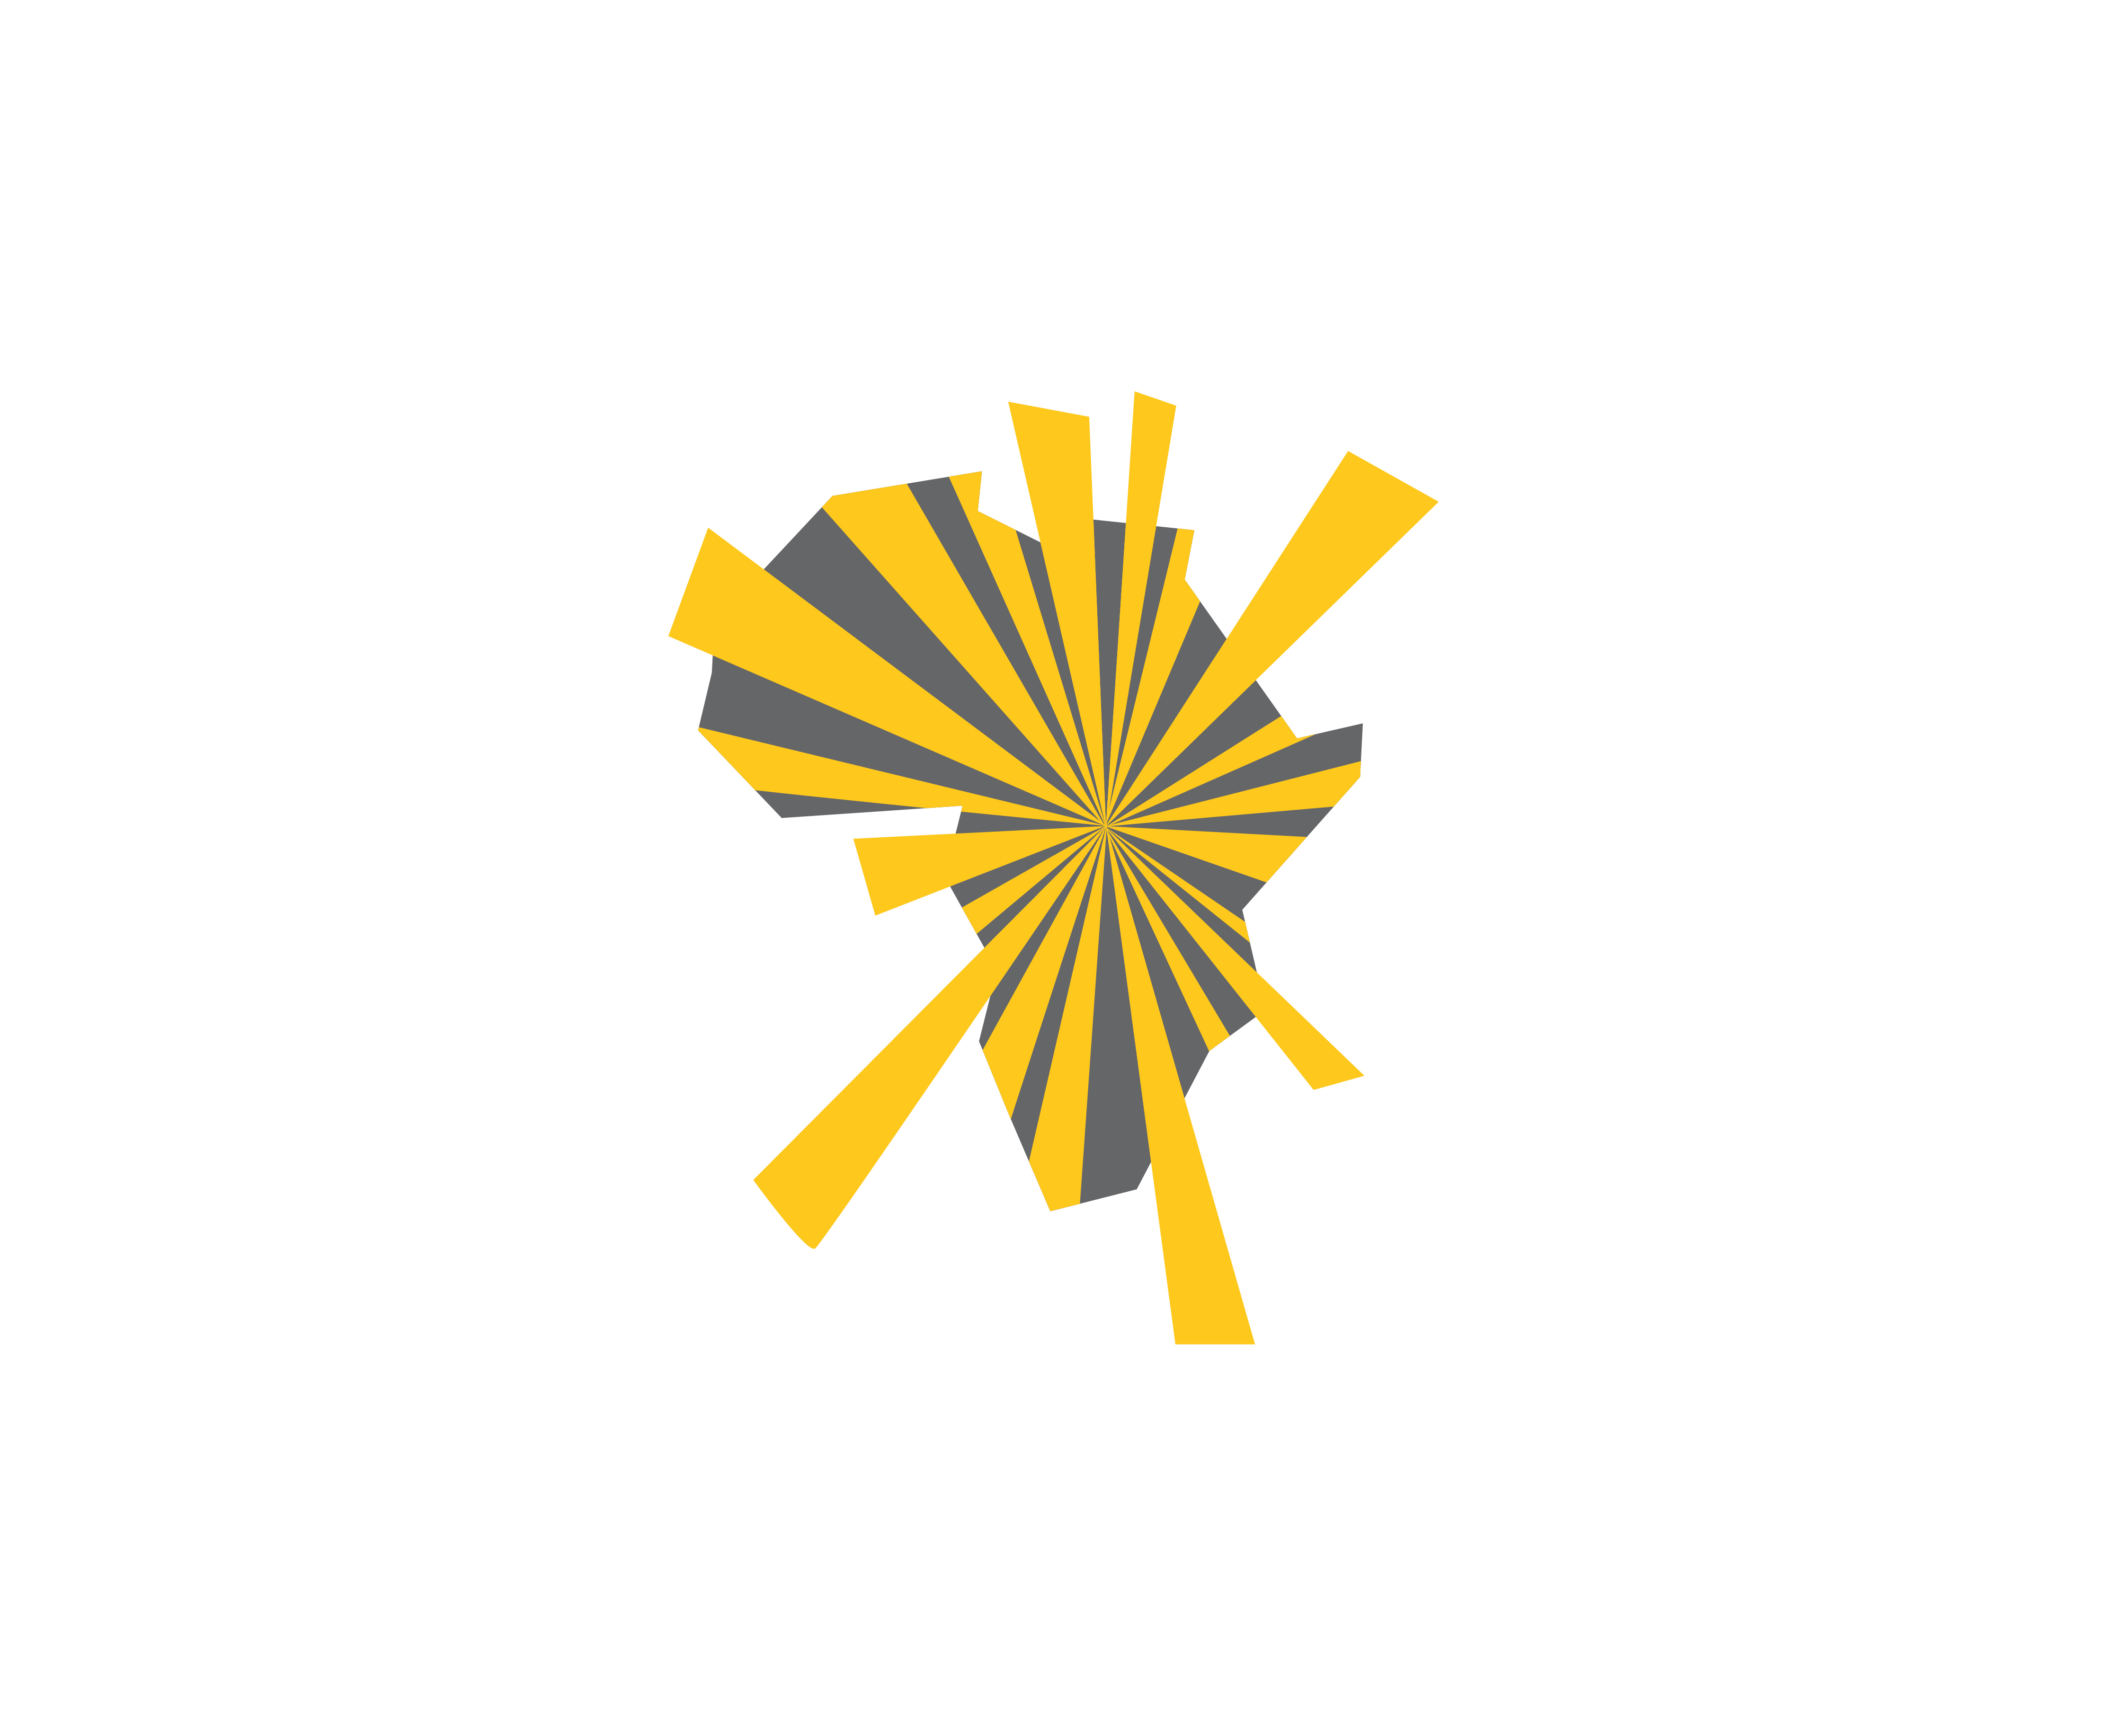 logos-for-sale-agent-orange-design-africa-ray.jpg